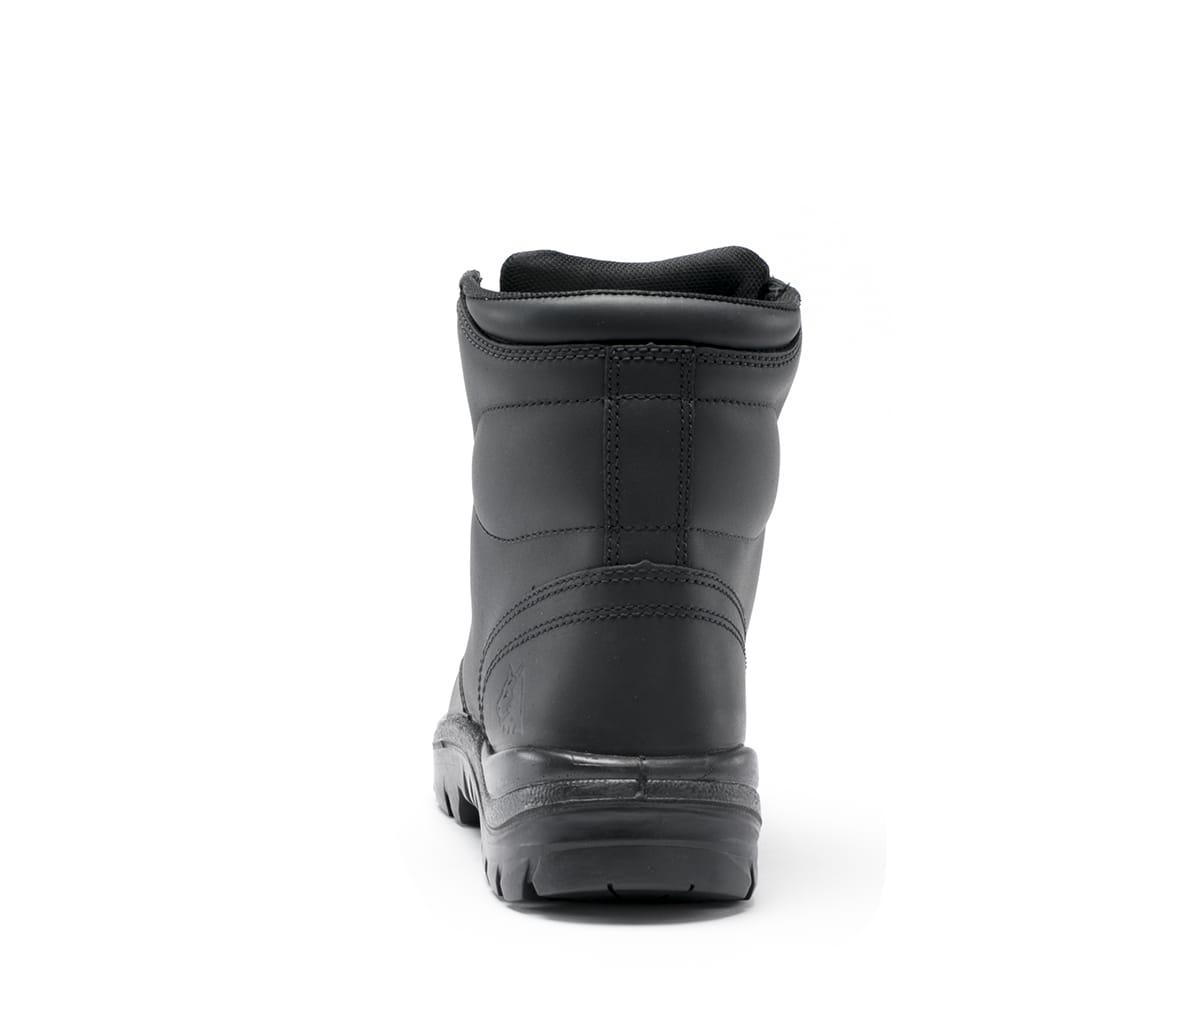 Argyle: TPU/Bump Cap - Black